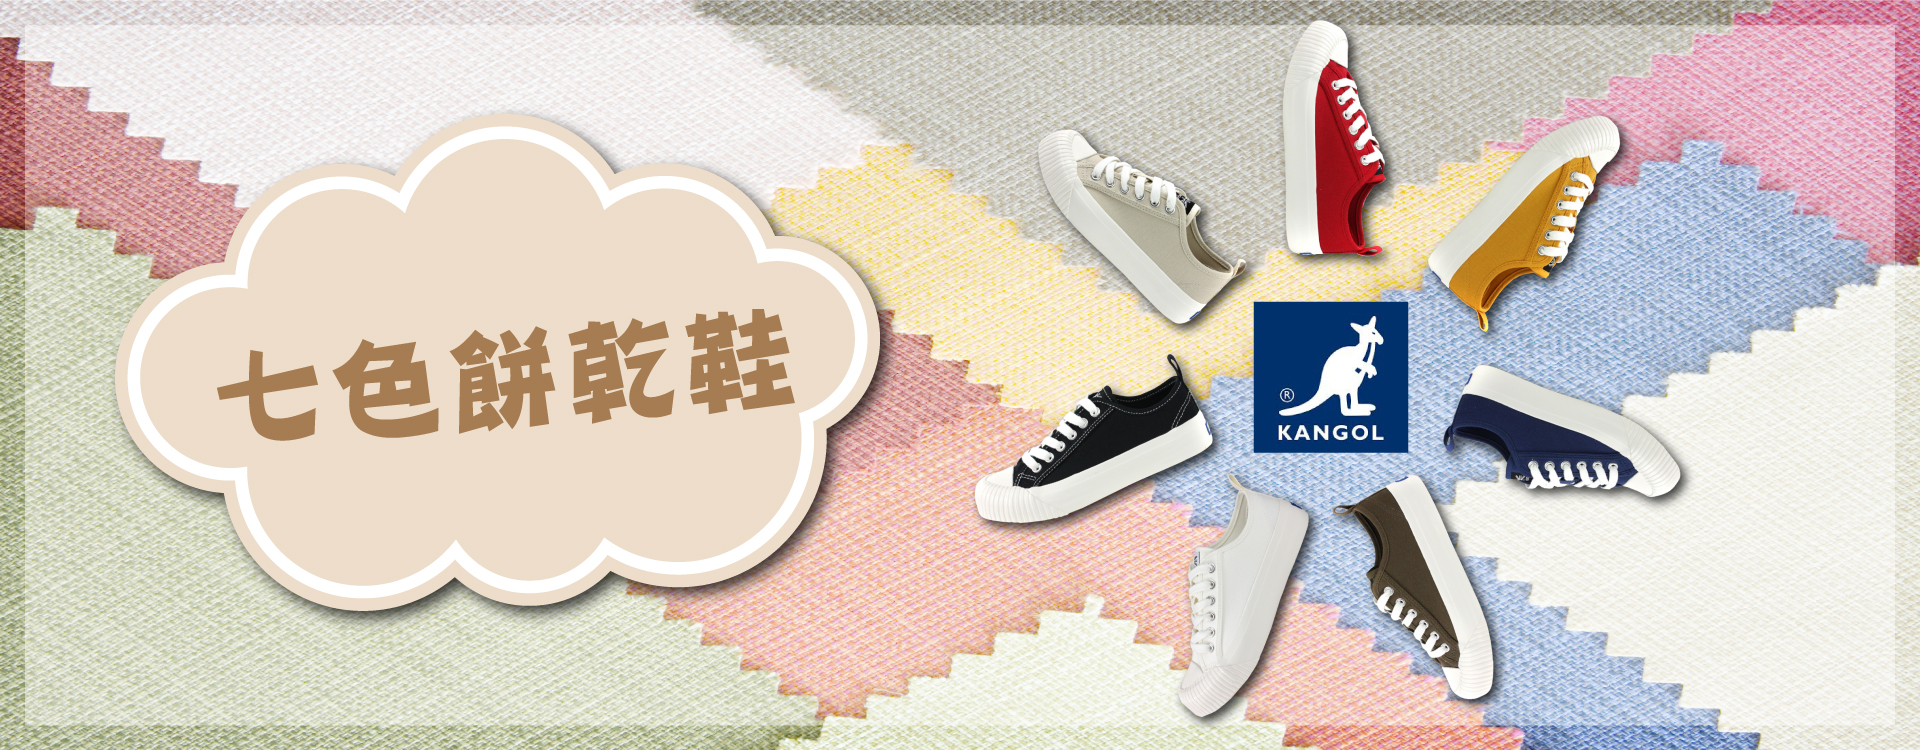 20200902_KANGOL七色餅乾鞋